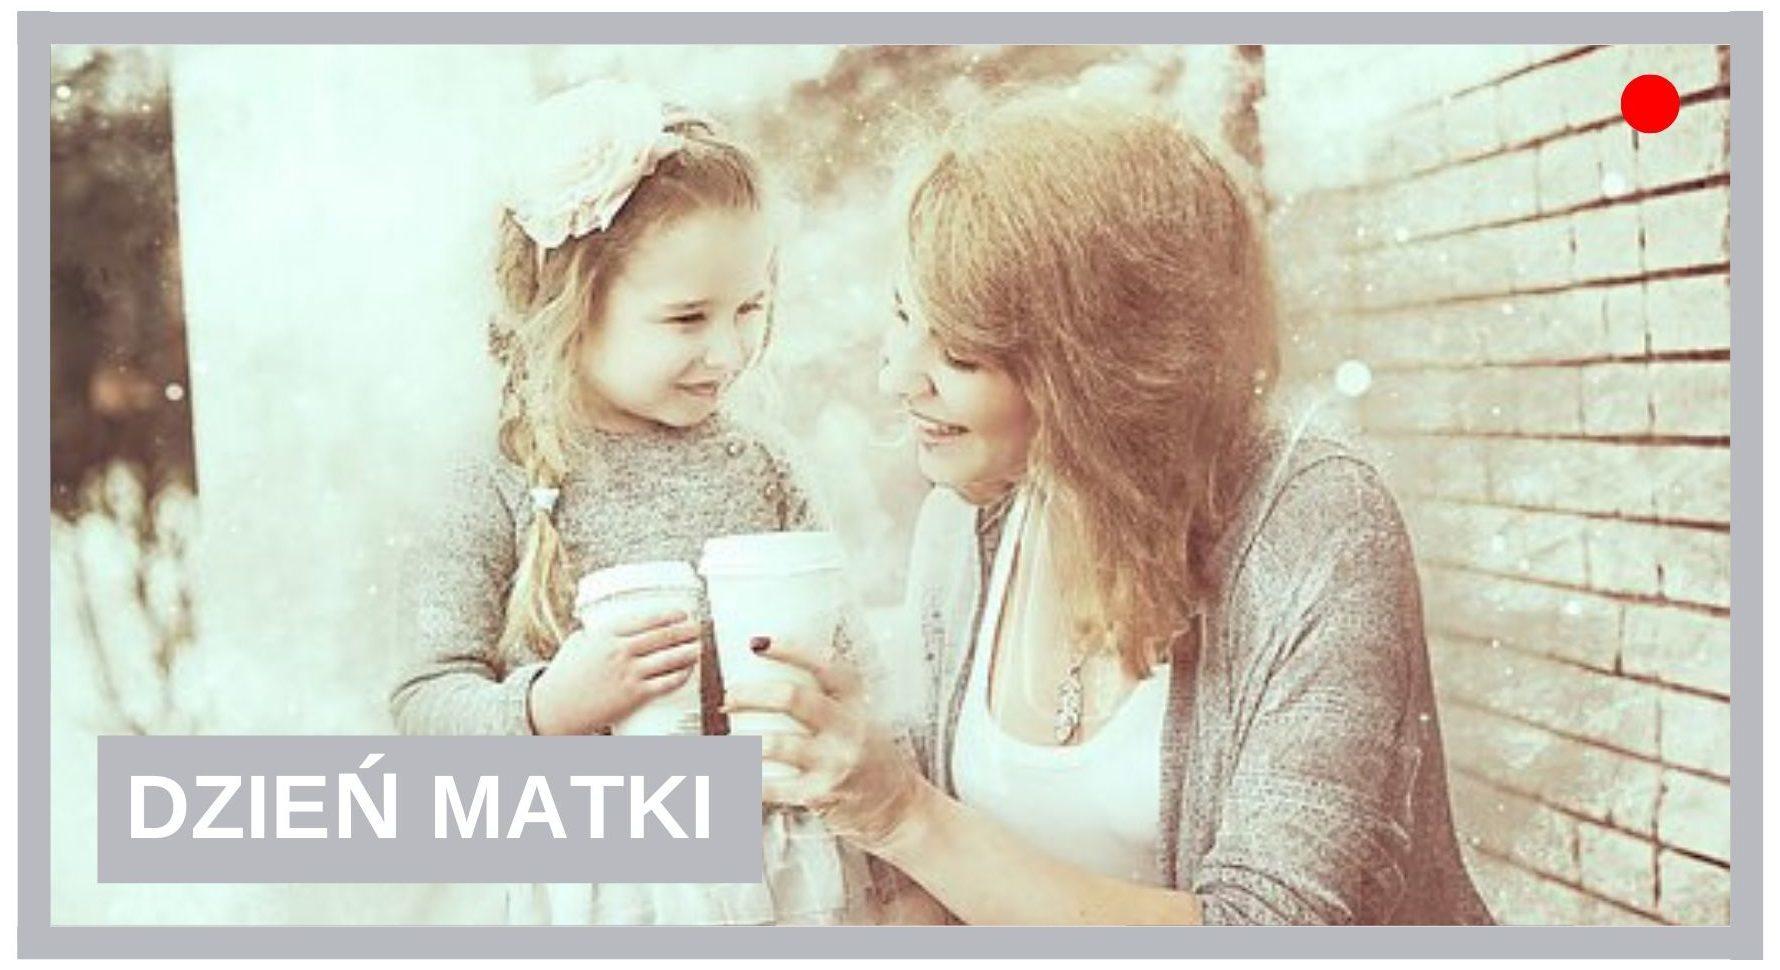 Blog Agnieszka Jasińska - Dzień Matki